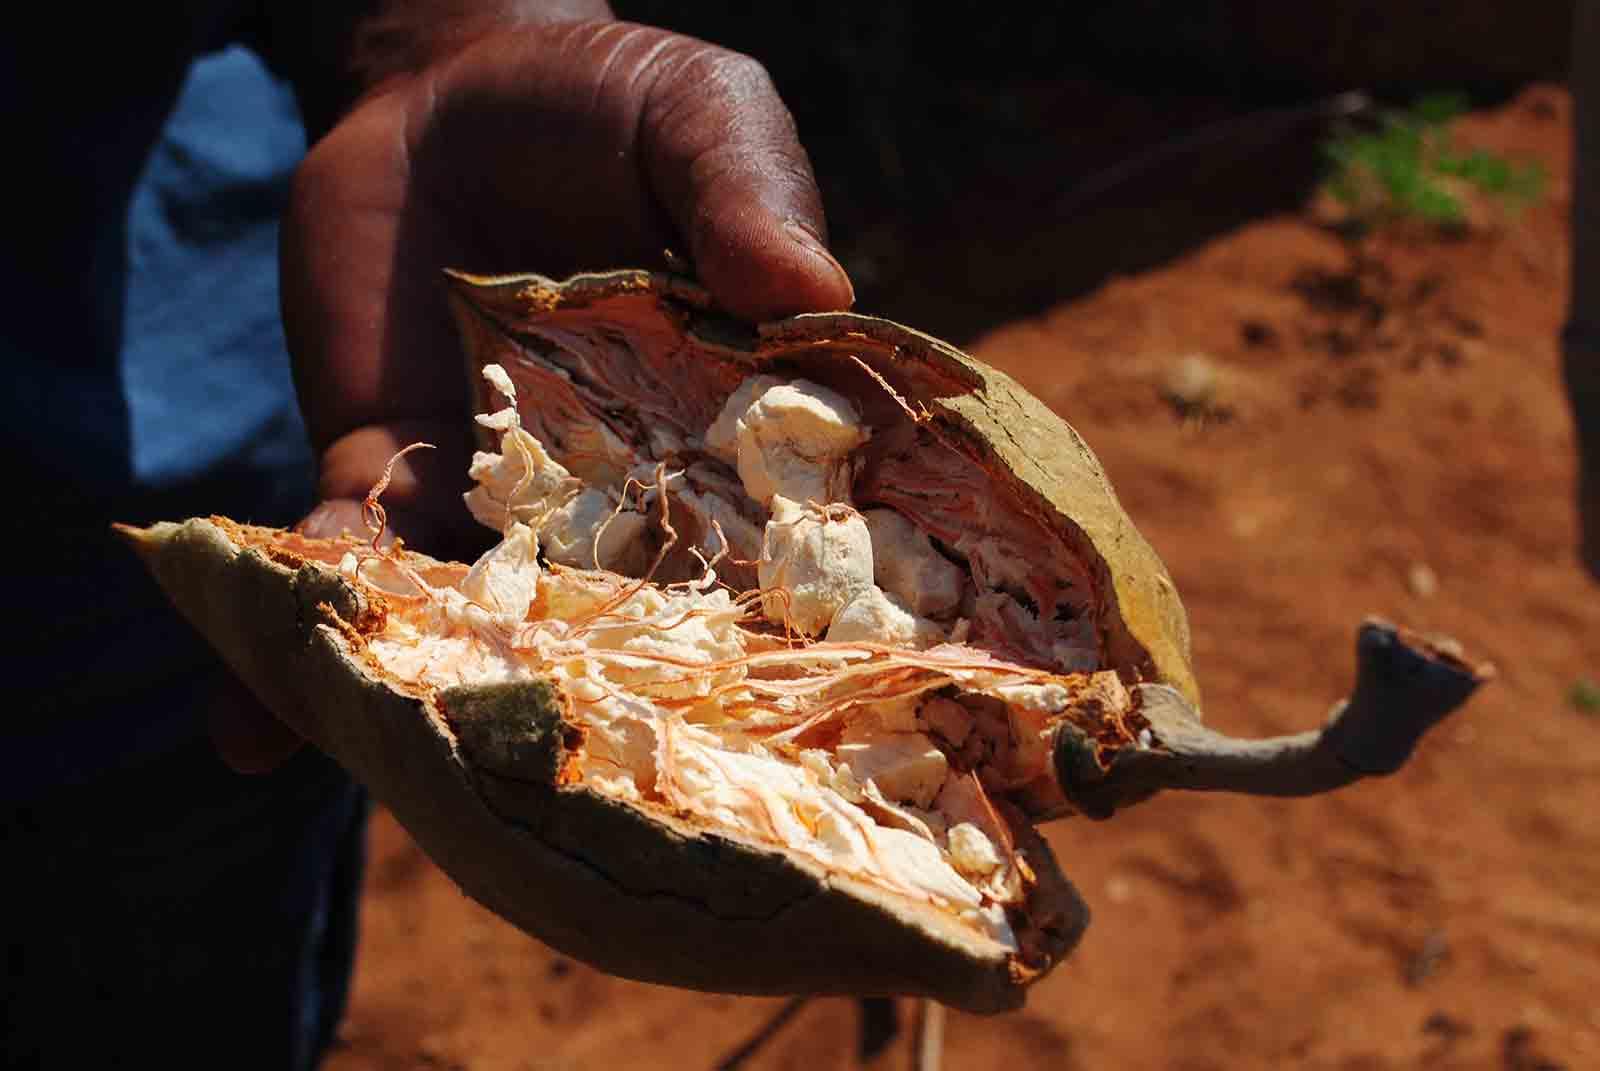 Baobaboel_aus-der-Baobabfrucht_Jalda-eu